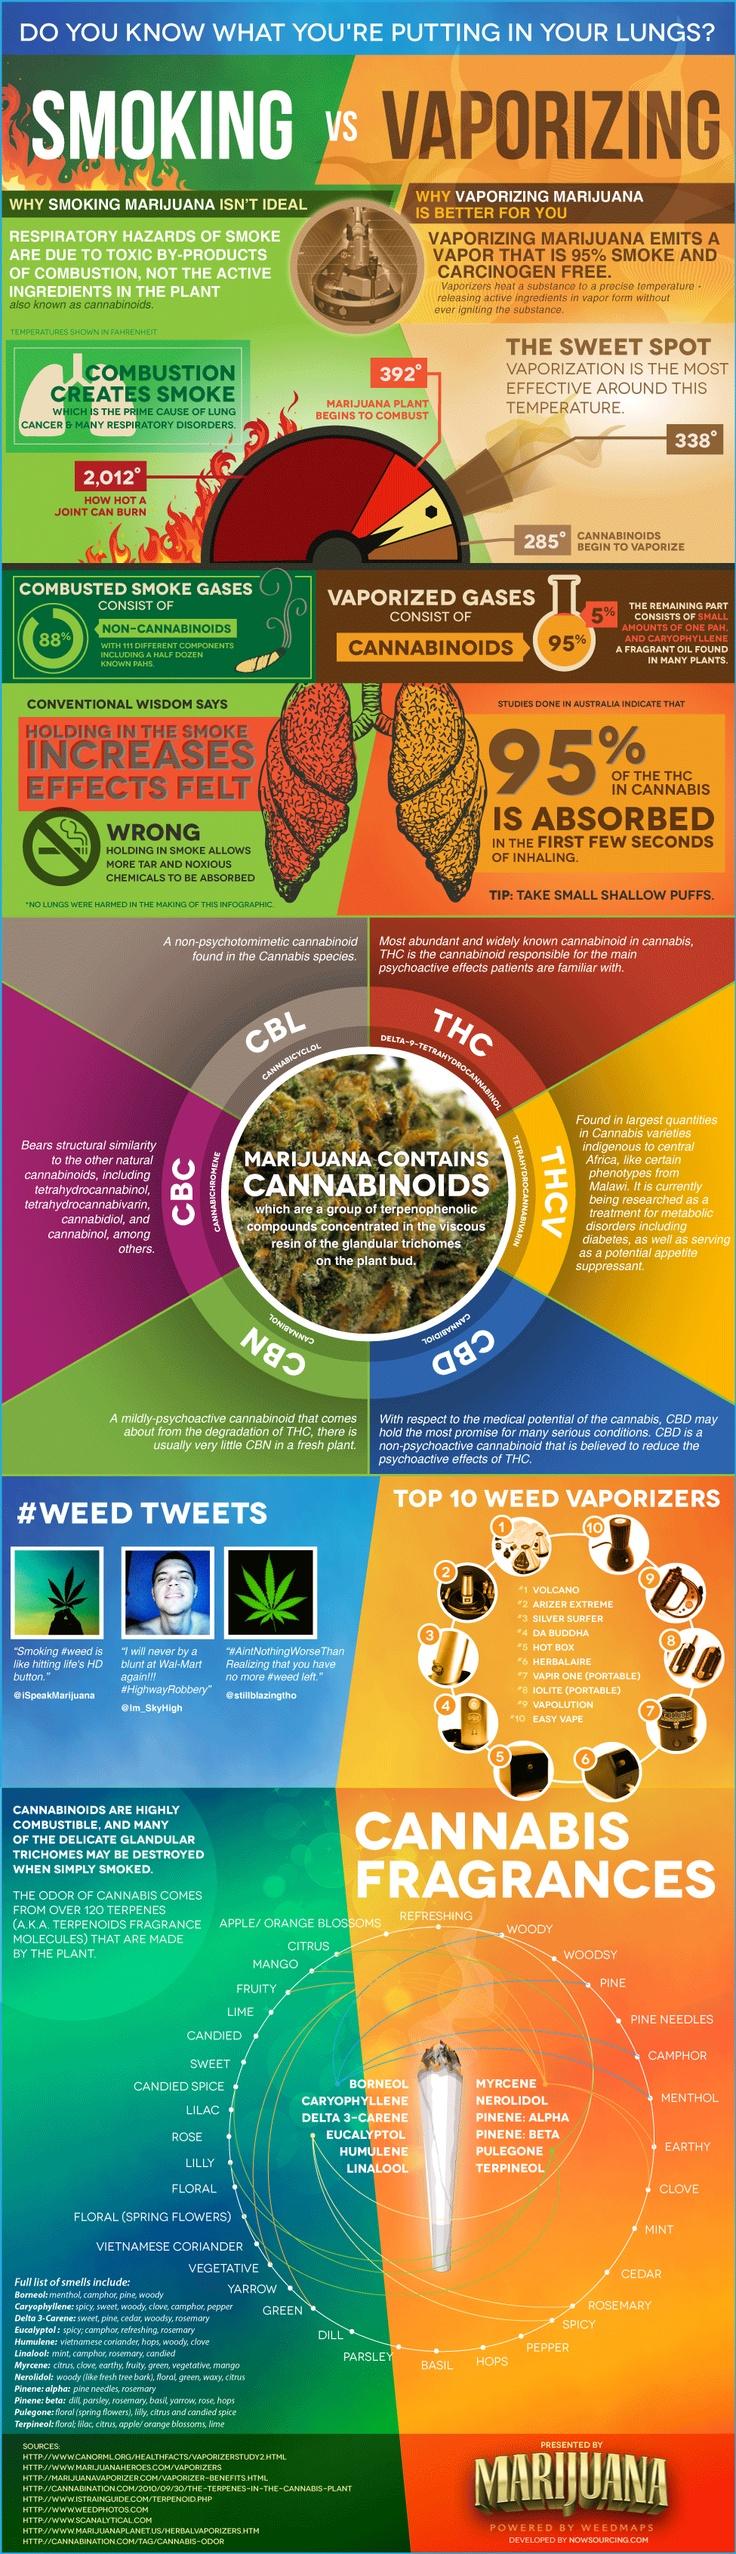 Marijuana - Smoking Vs Vaping